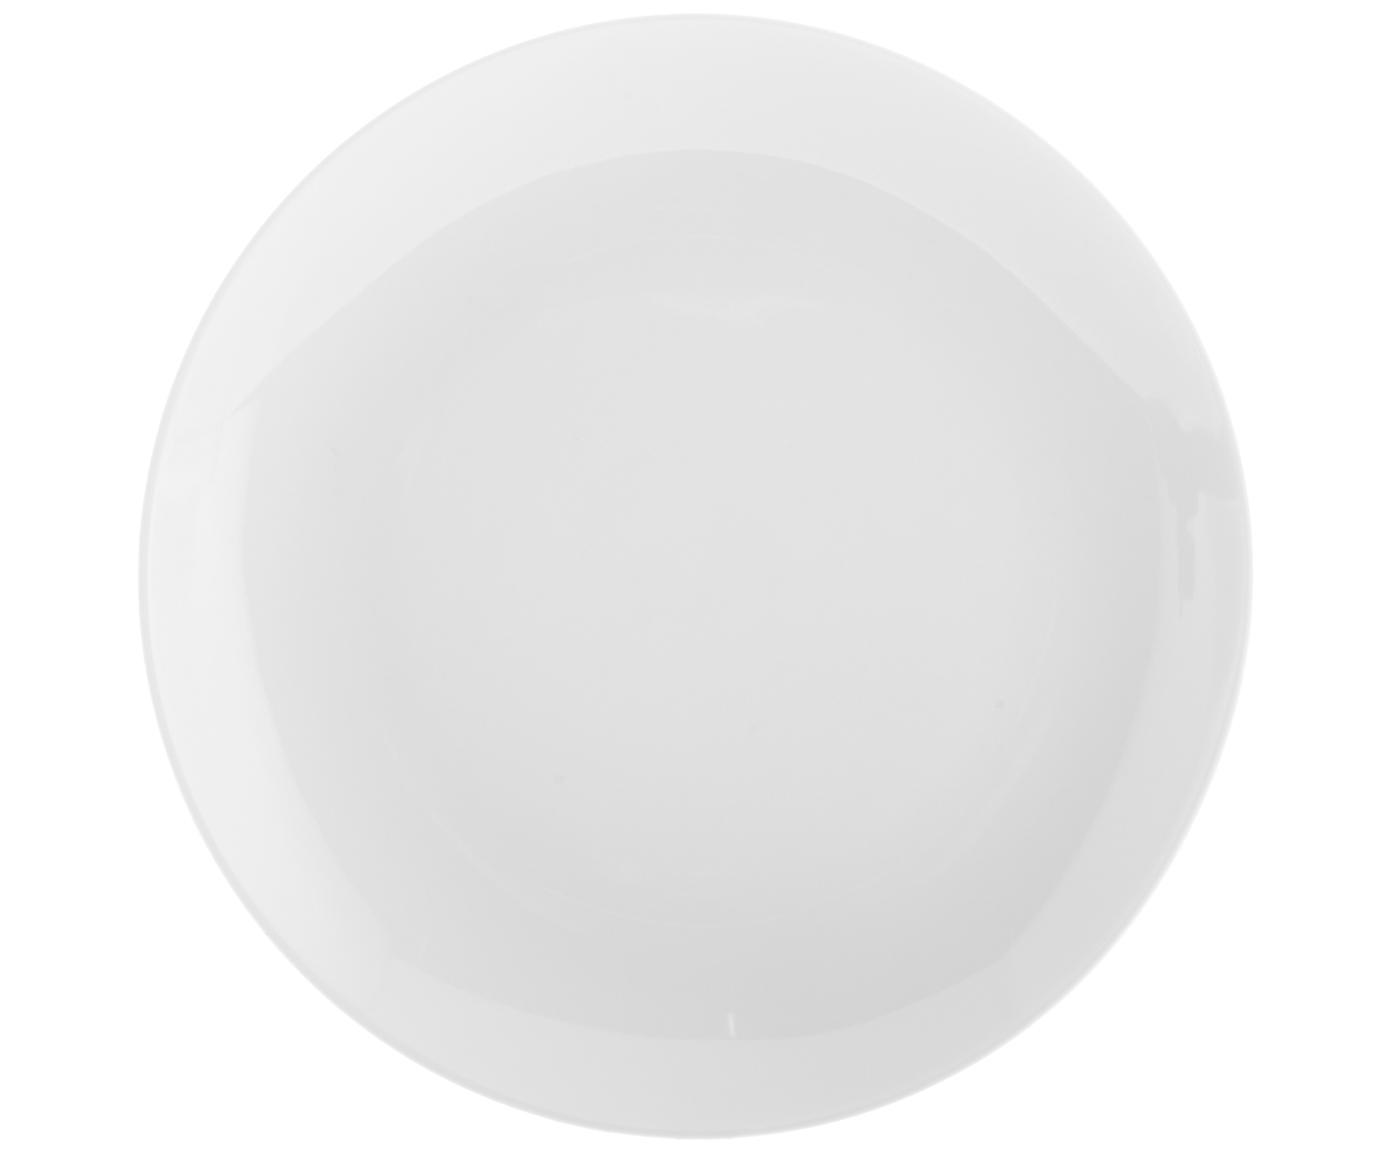 Platos de postre Delight Modern, 2uds., Porcelana, Blanco, Ø 20 cm